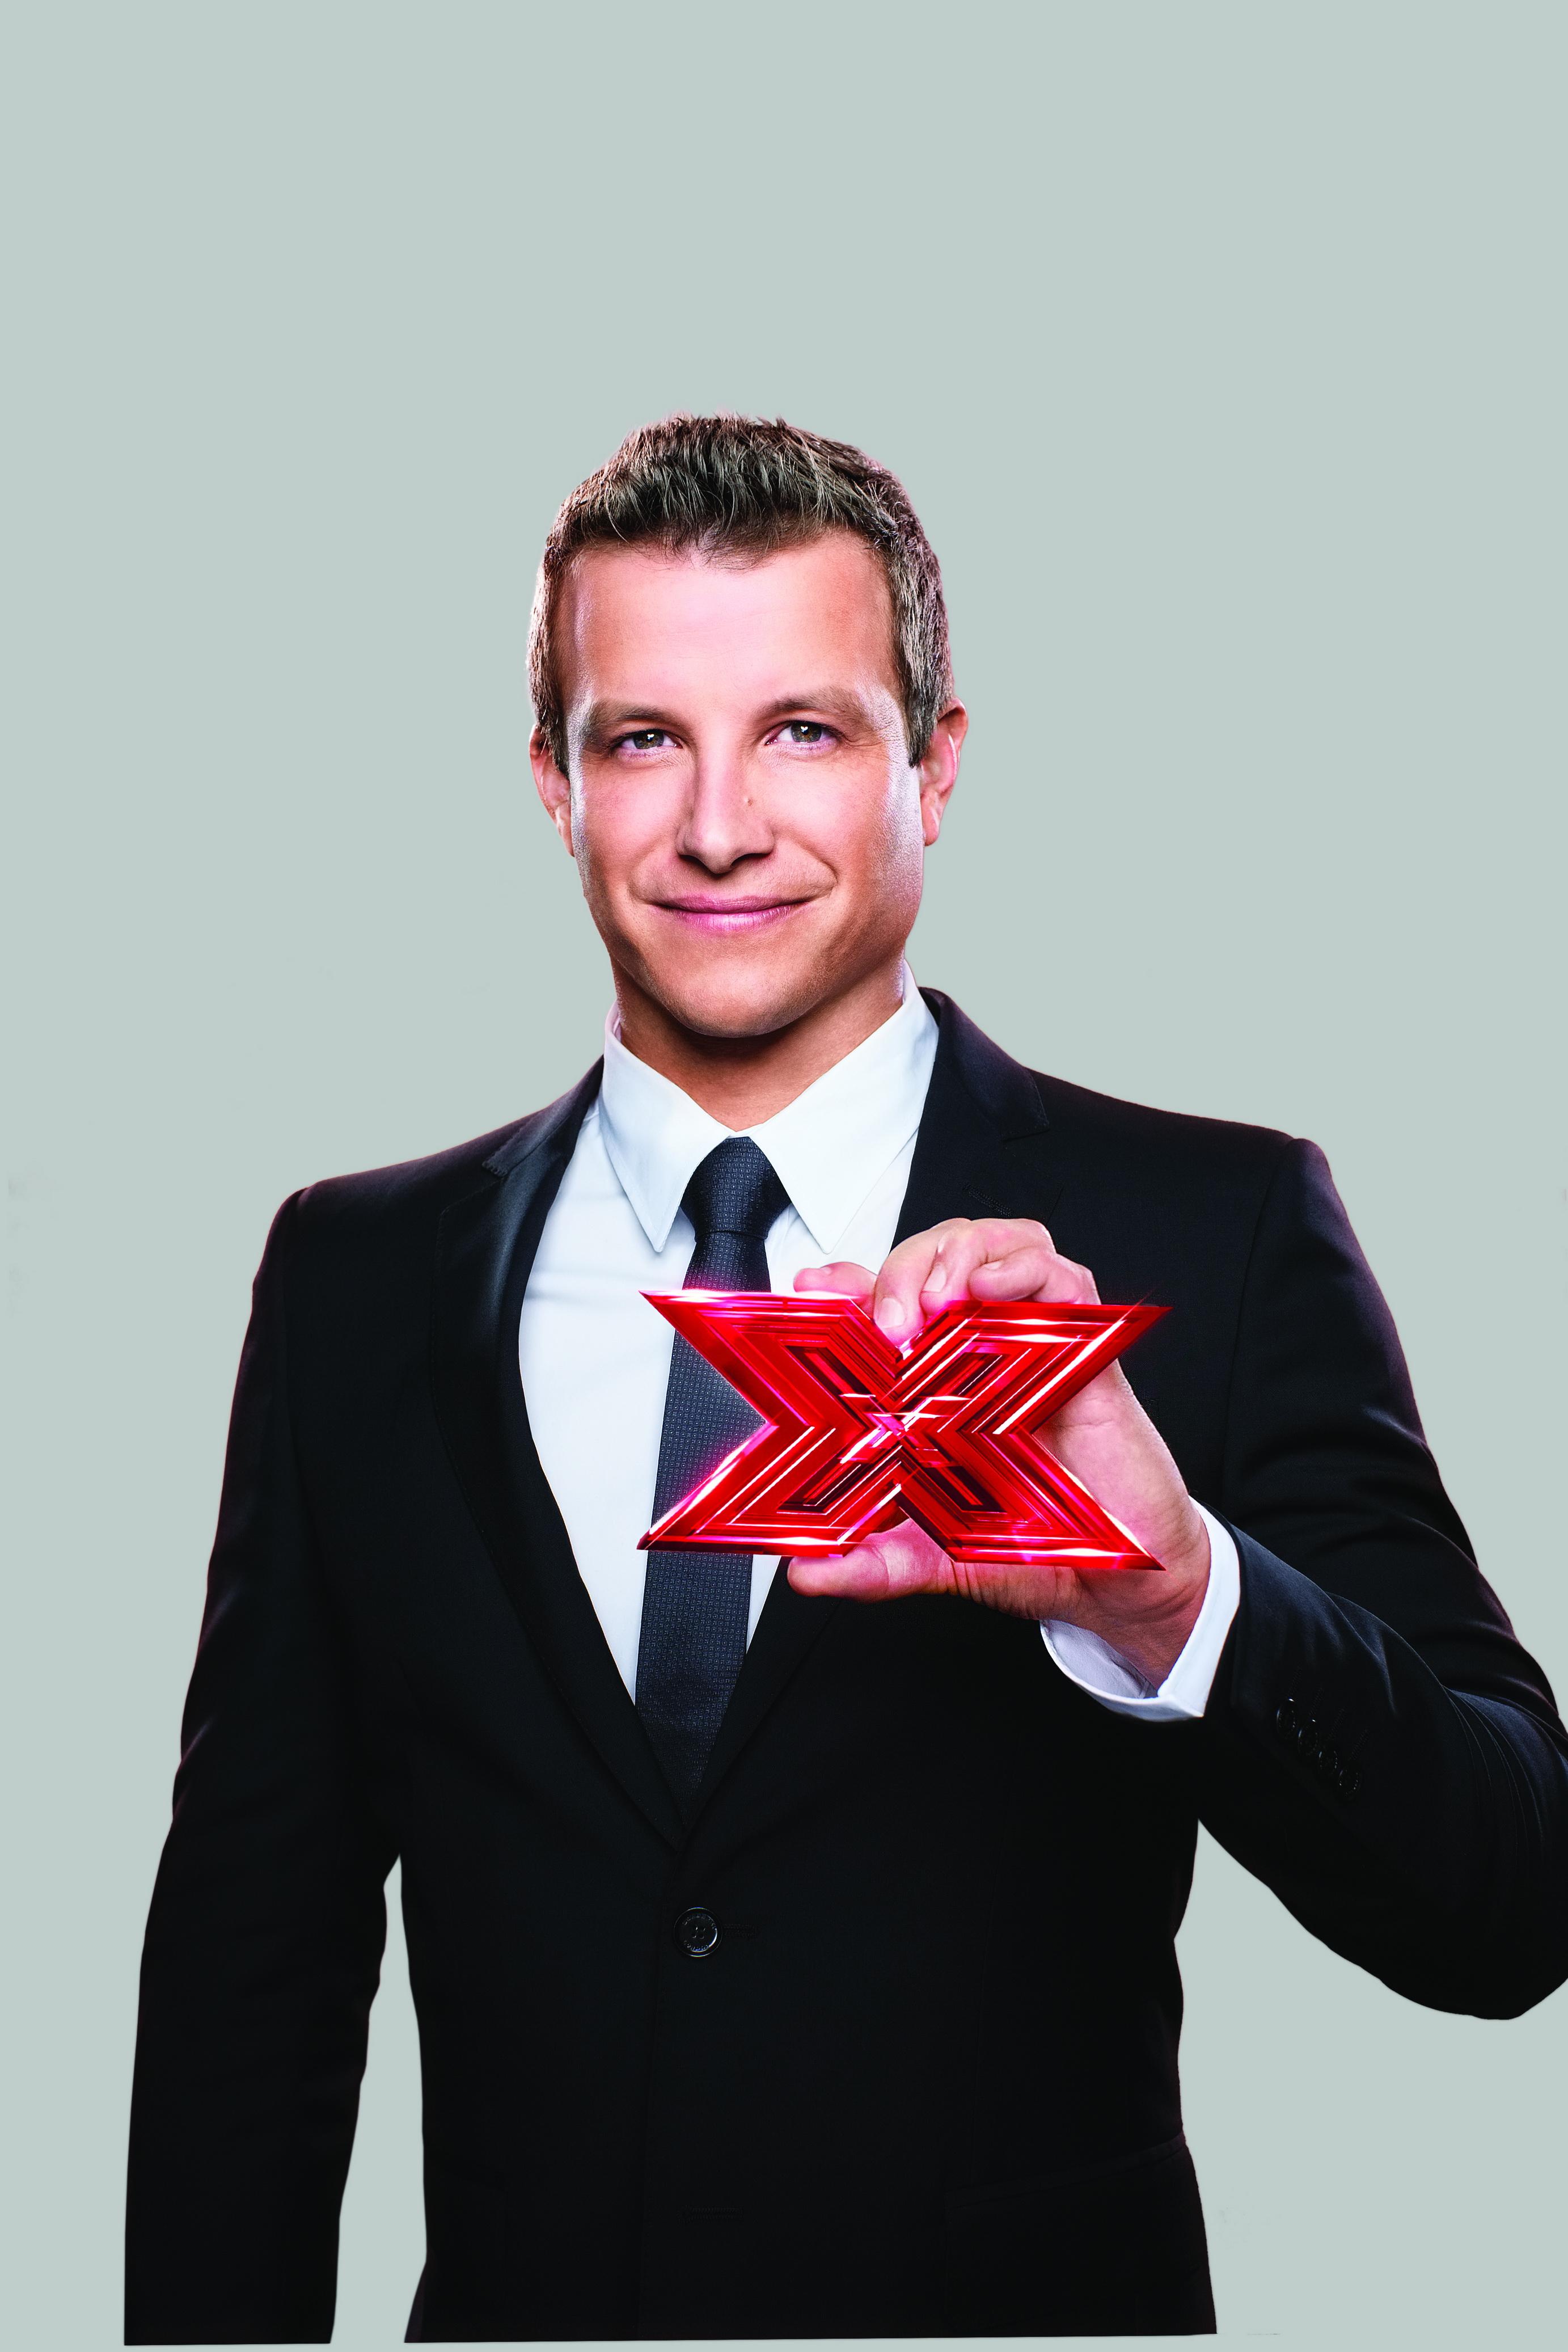 Luke Jacobz has the X Factor